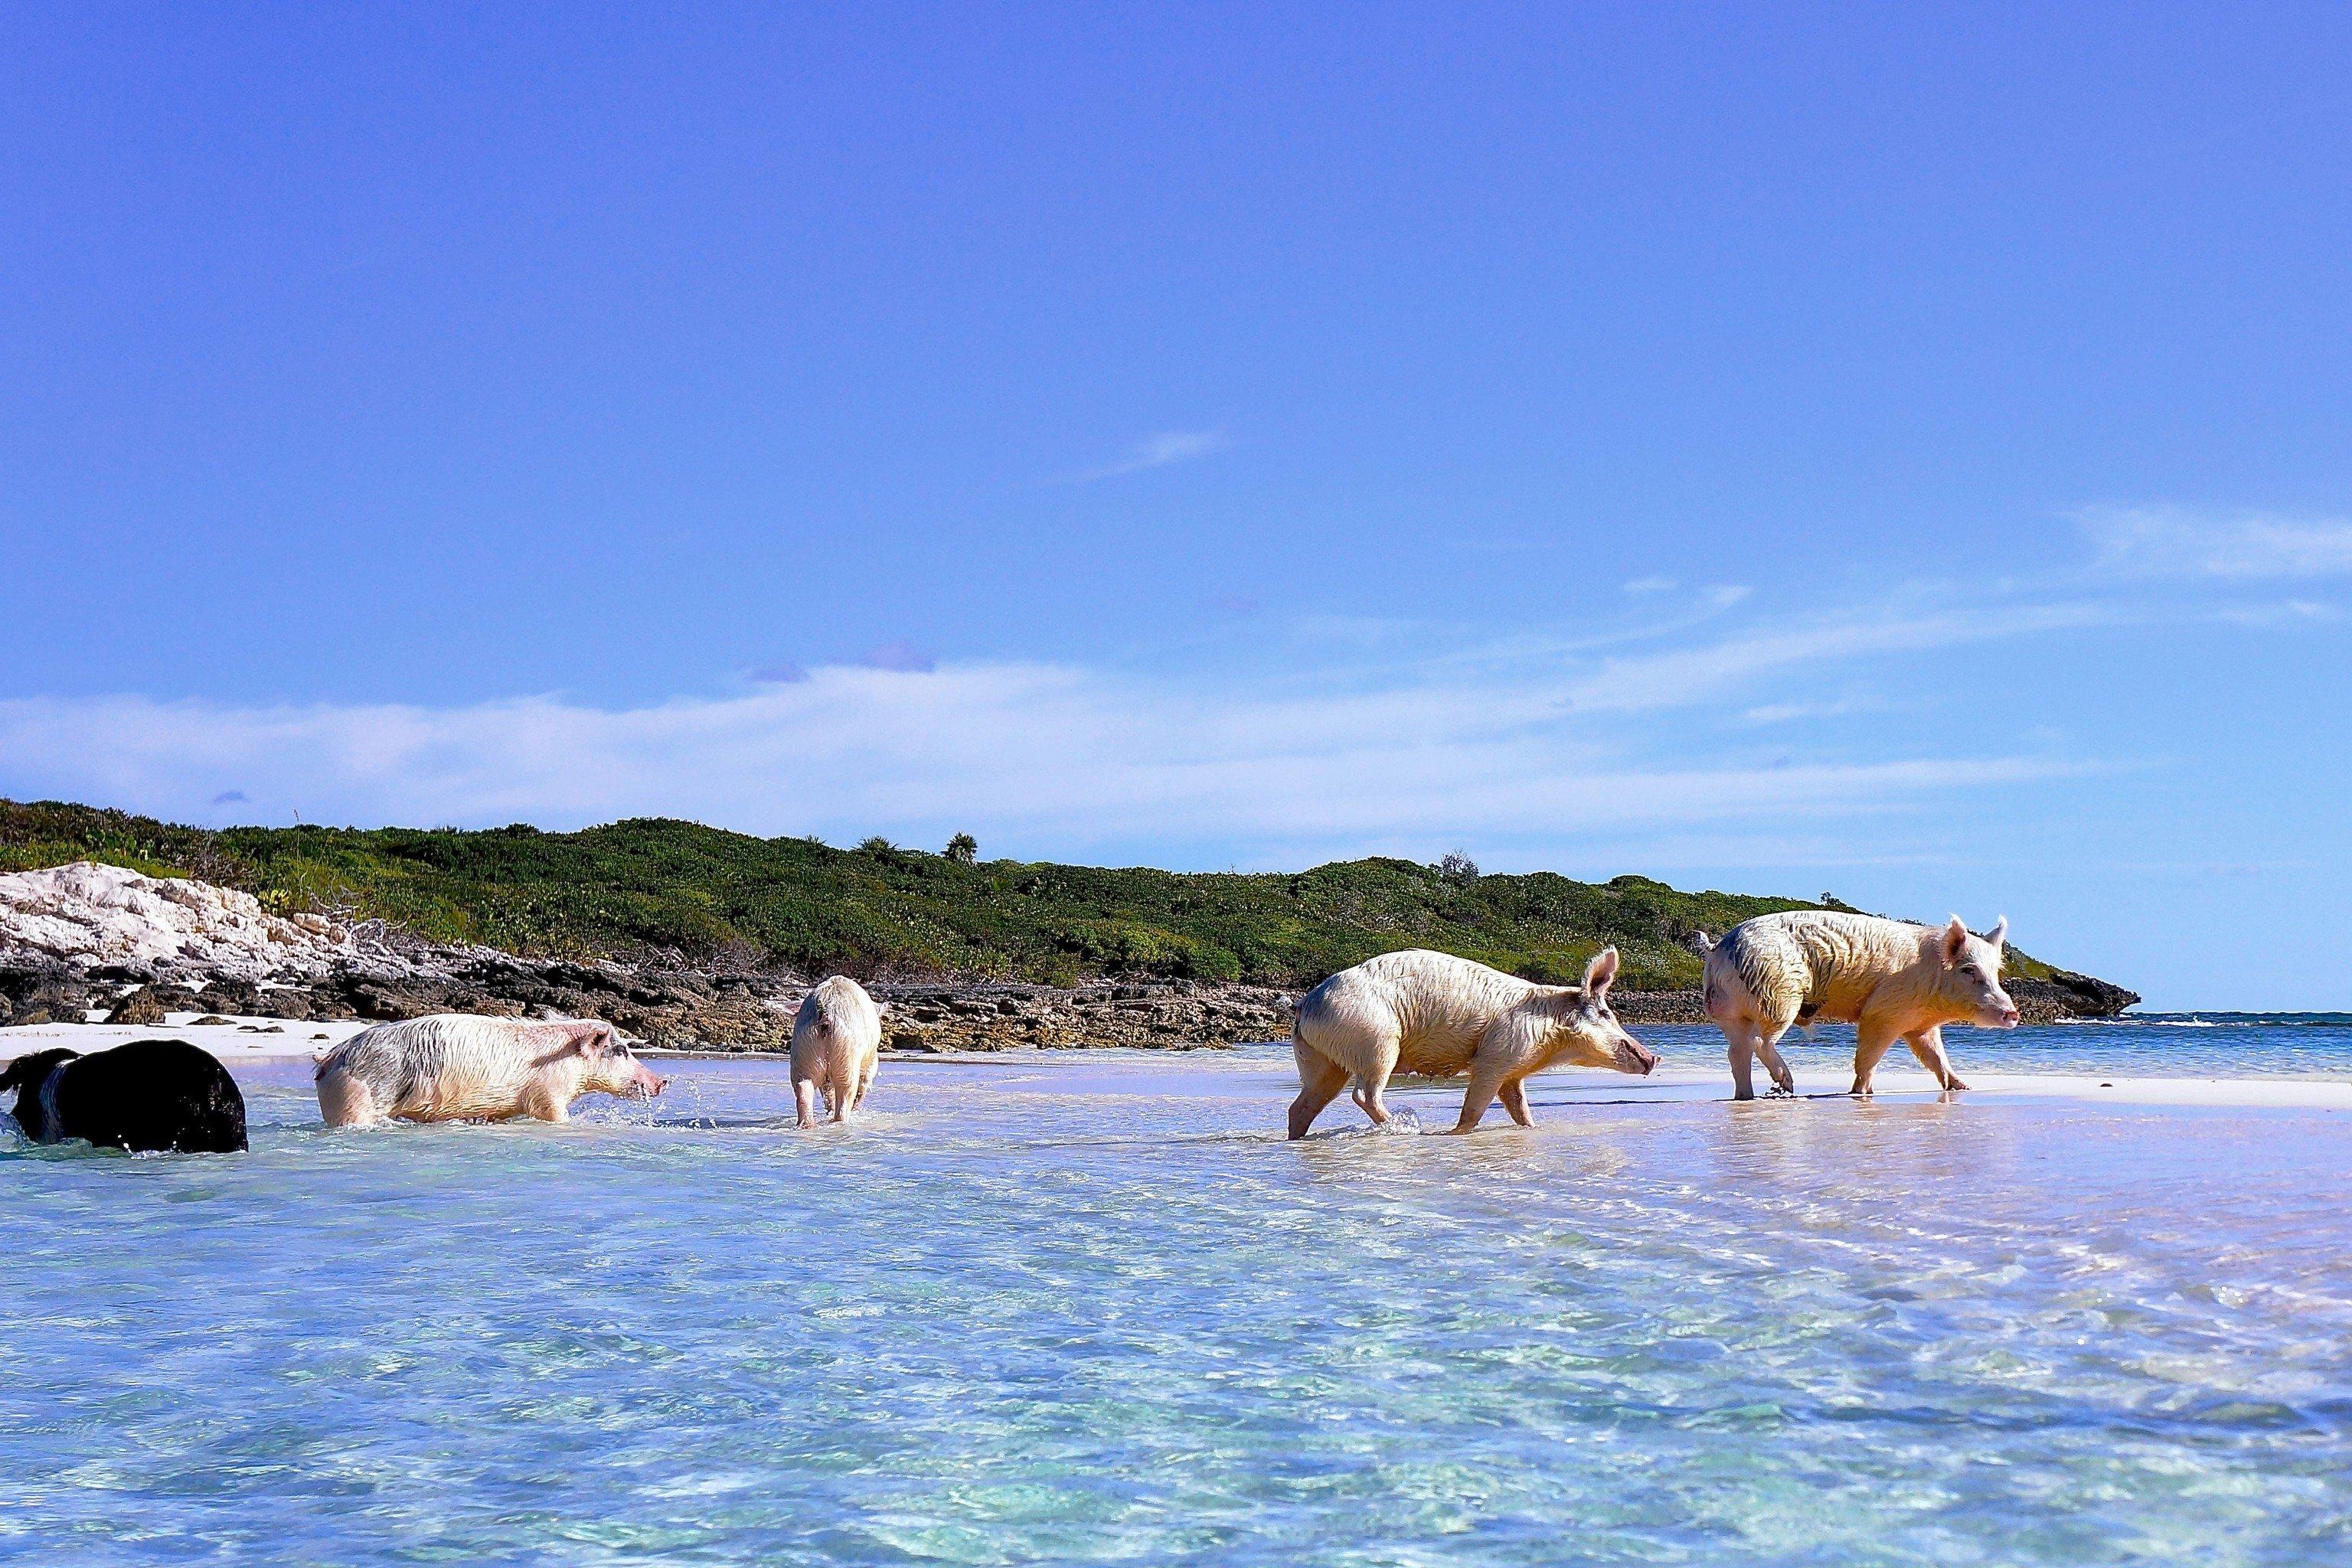 Hotels Offbeat sky outdoor water Beach Sea vacation Ocean Coast shore mammal Island